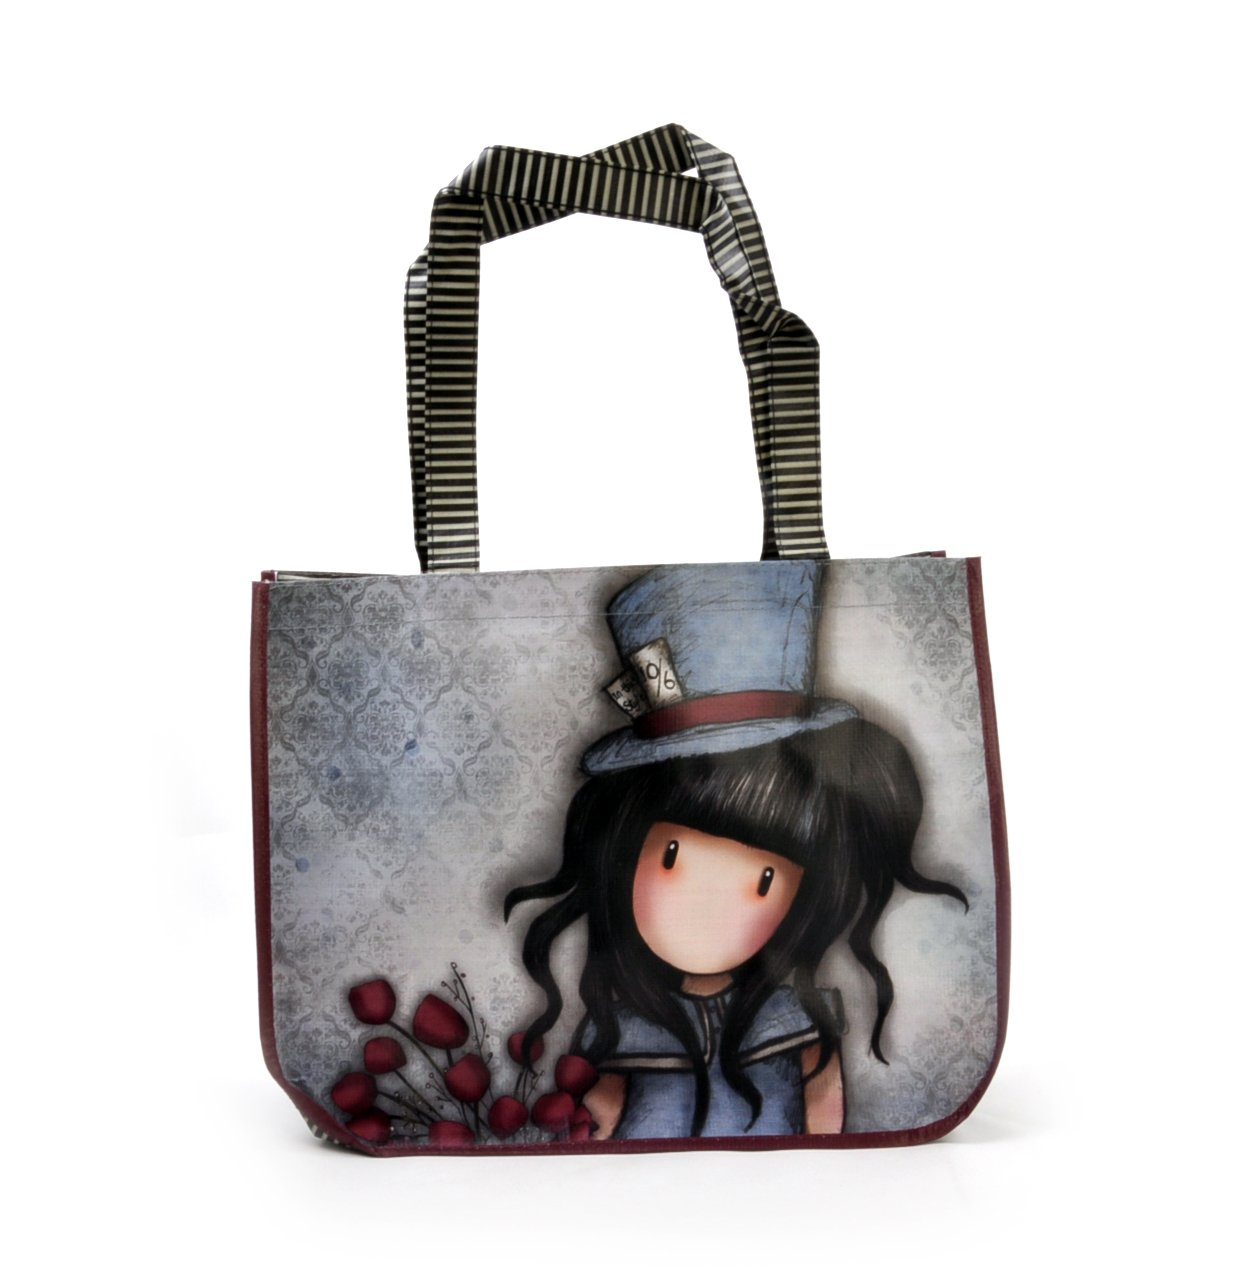 Hatter - Sac à provisions / sac à main par Gorjuss